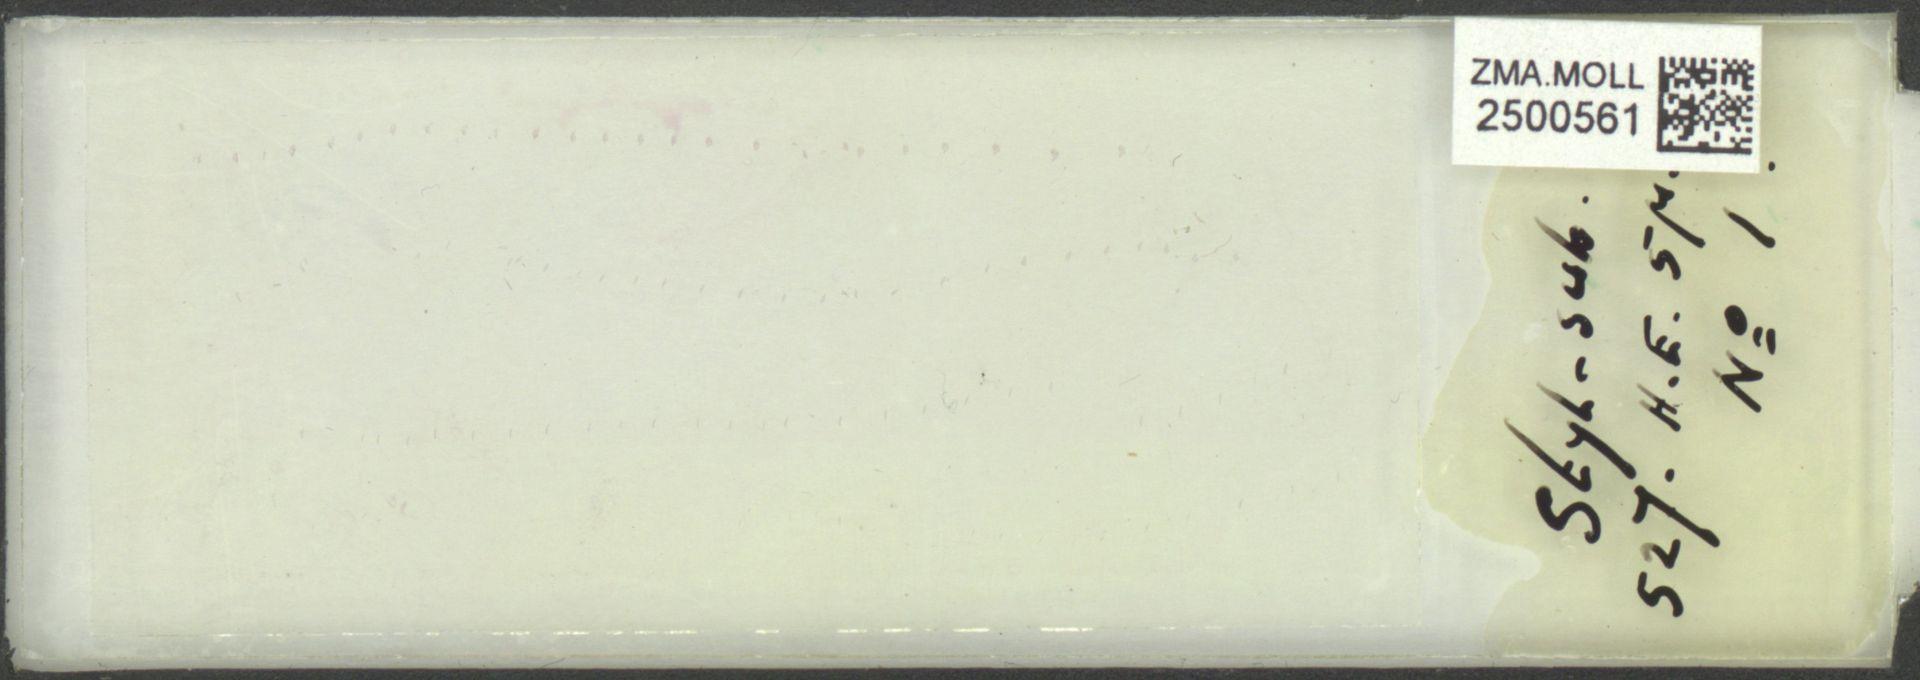 ZMA.MOLL.2500561 | Styliola subula (Quoy & Gaimard, 1827)